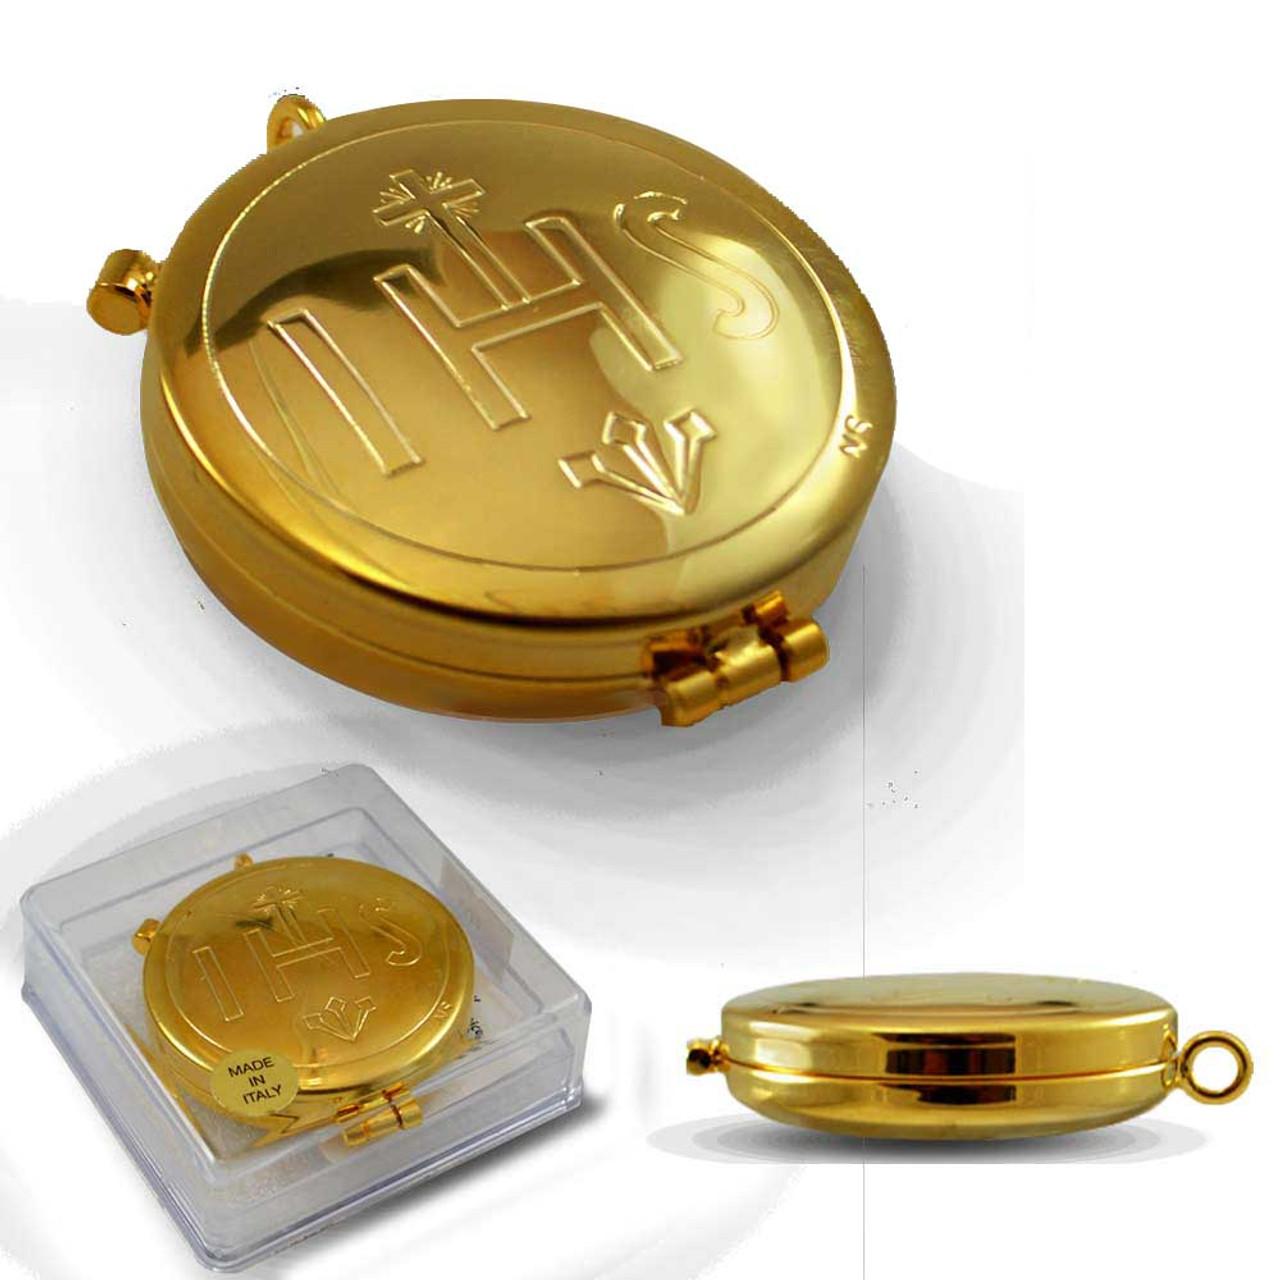 CS 503 Large Gold Plate Pyx